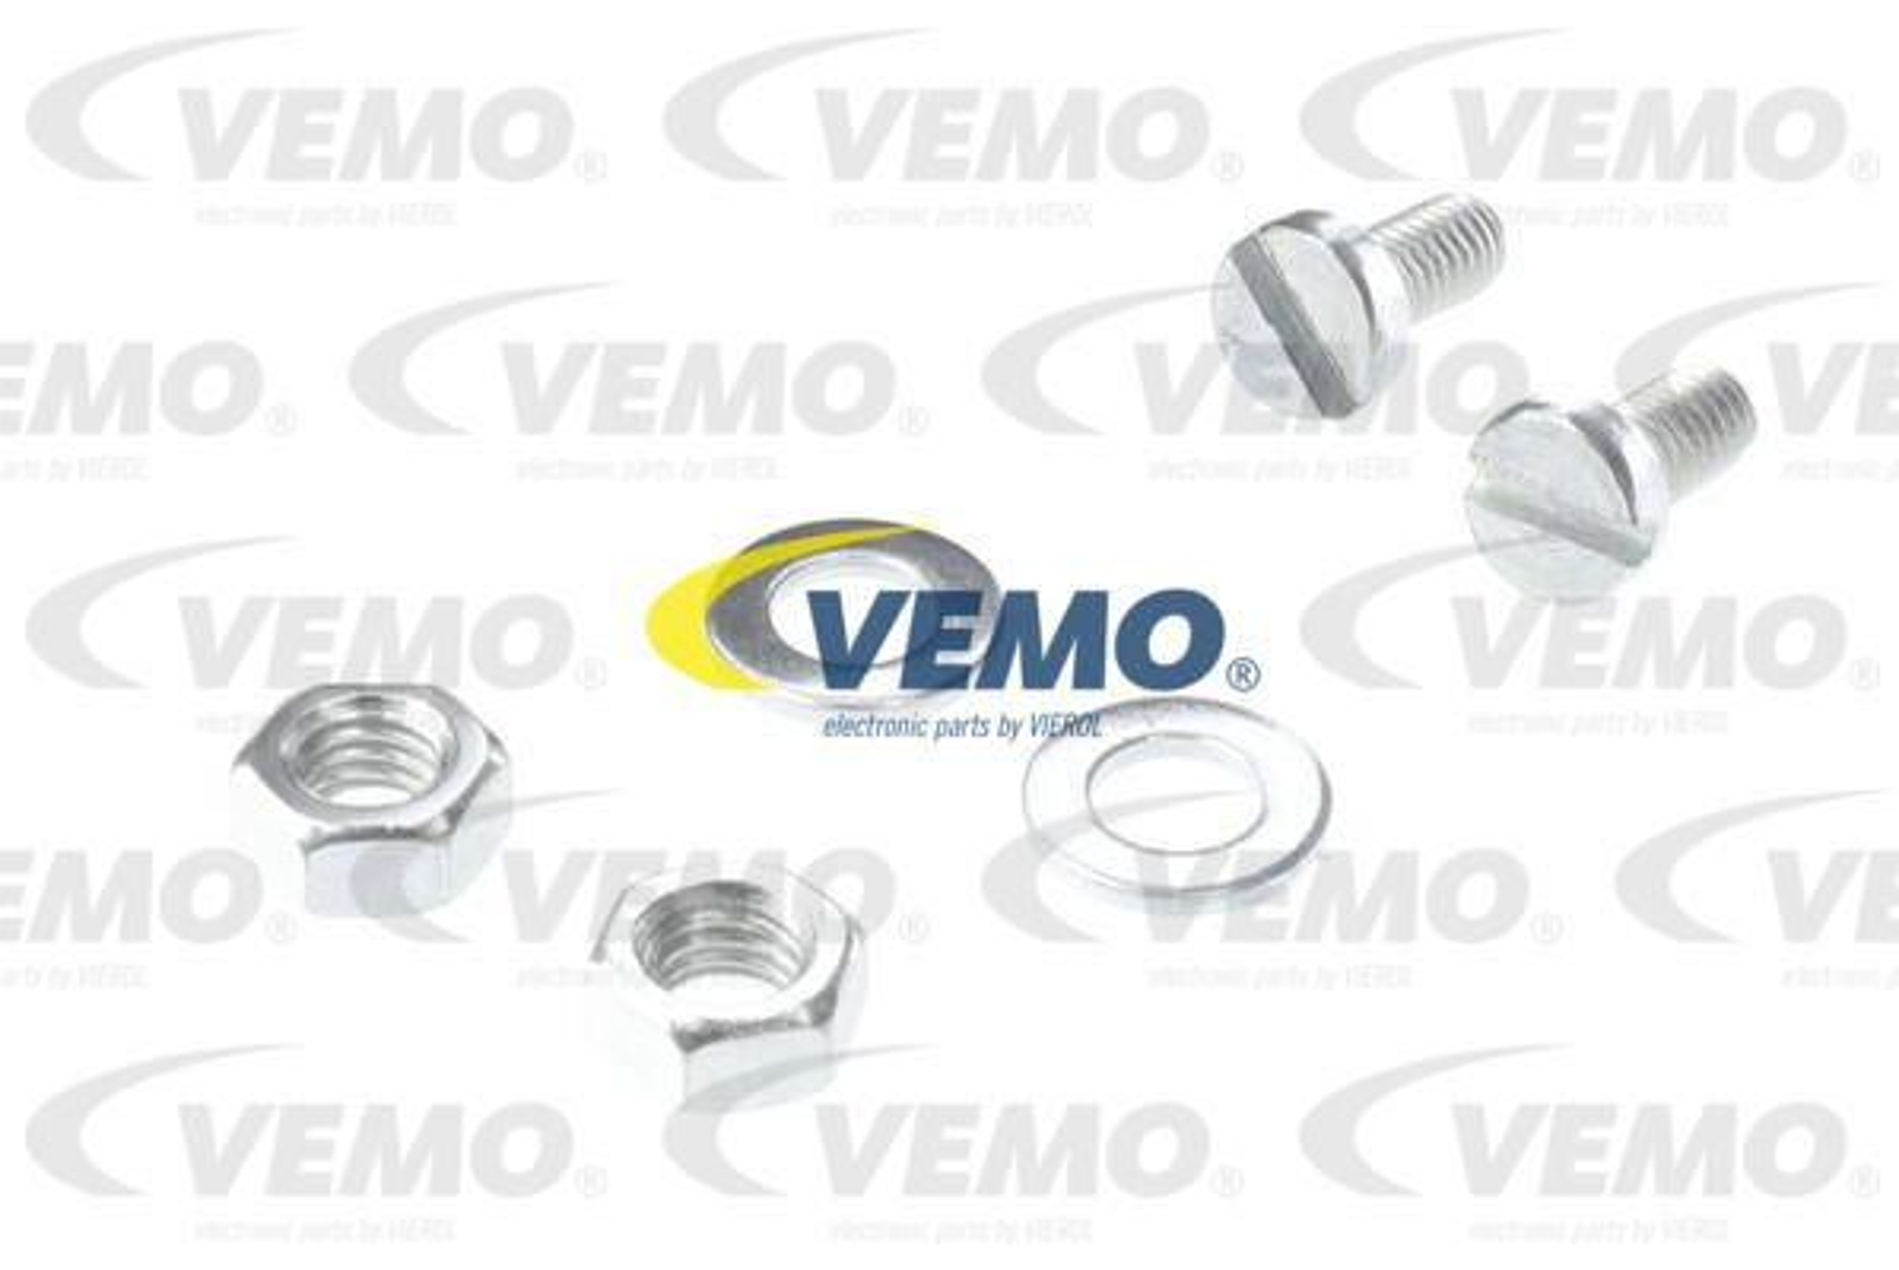 V10771019 Lichtmaschinenregler VEMO V10-77-1019 - Große Auswahl - stark reduziert